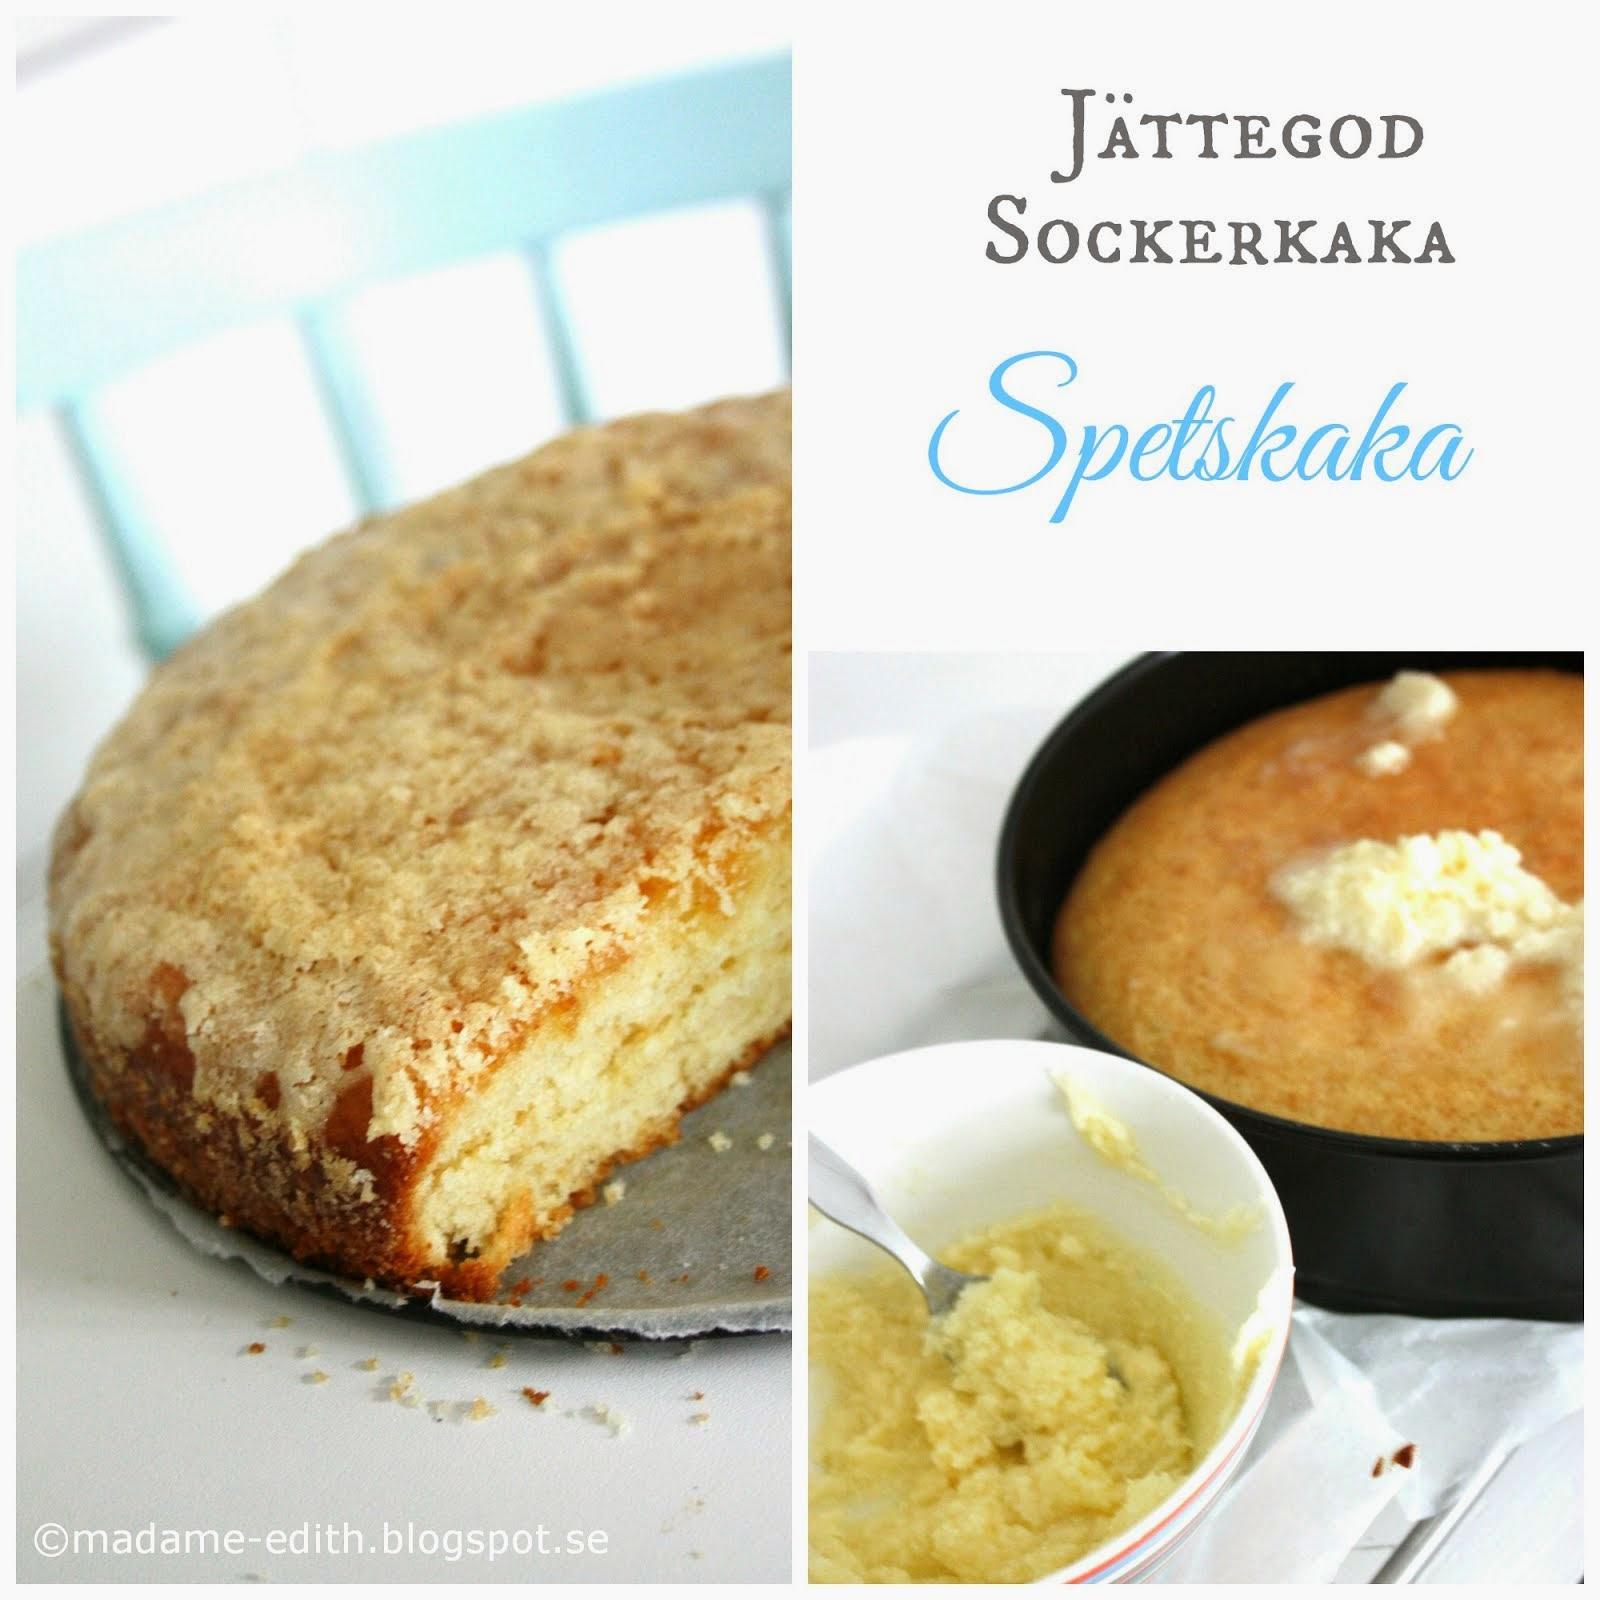 Sockerkaka - Spetskaka - En favoritkaka